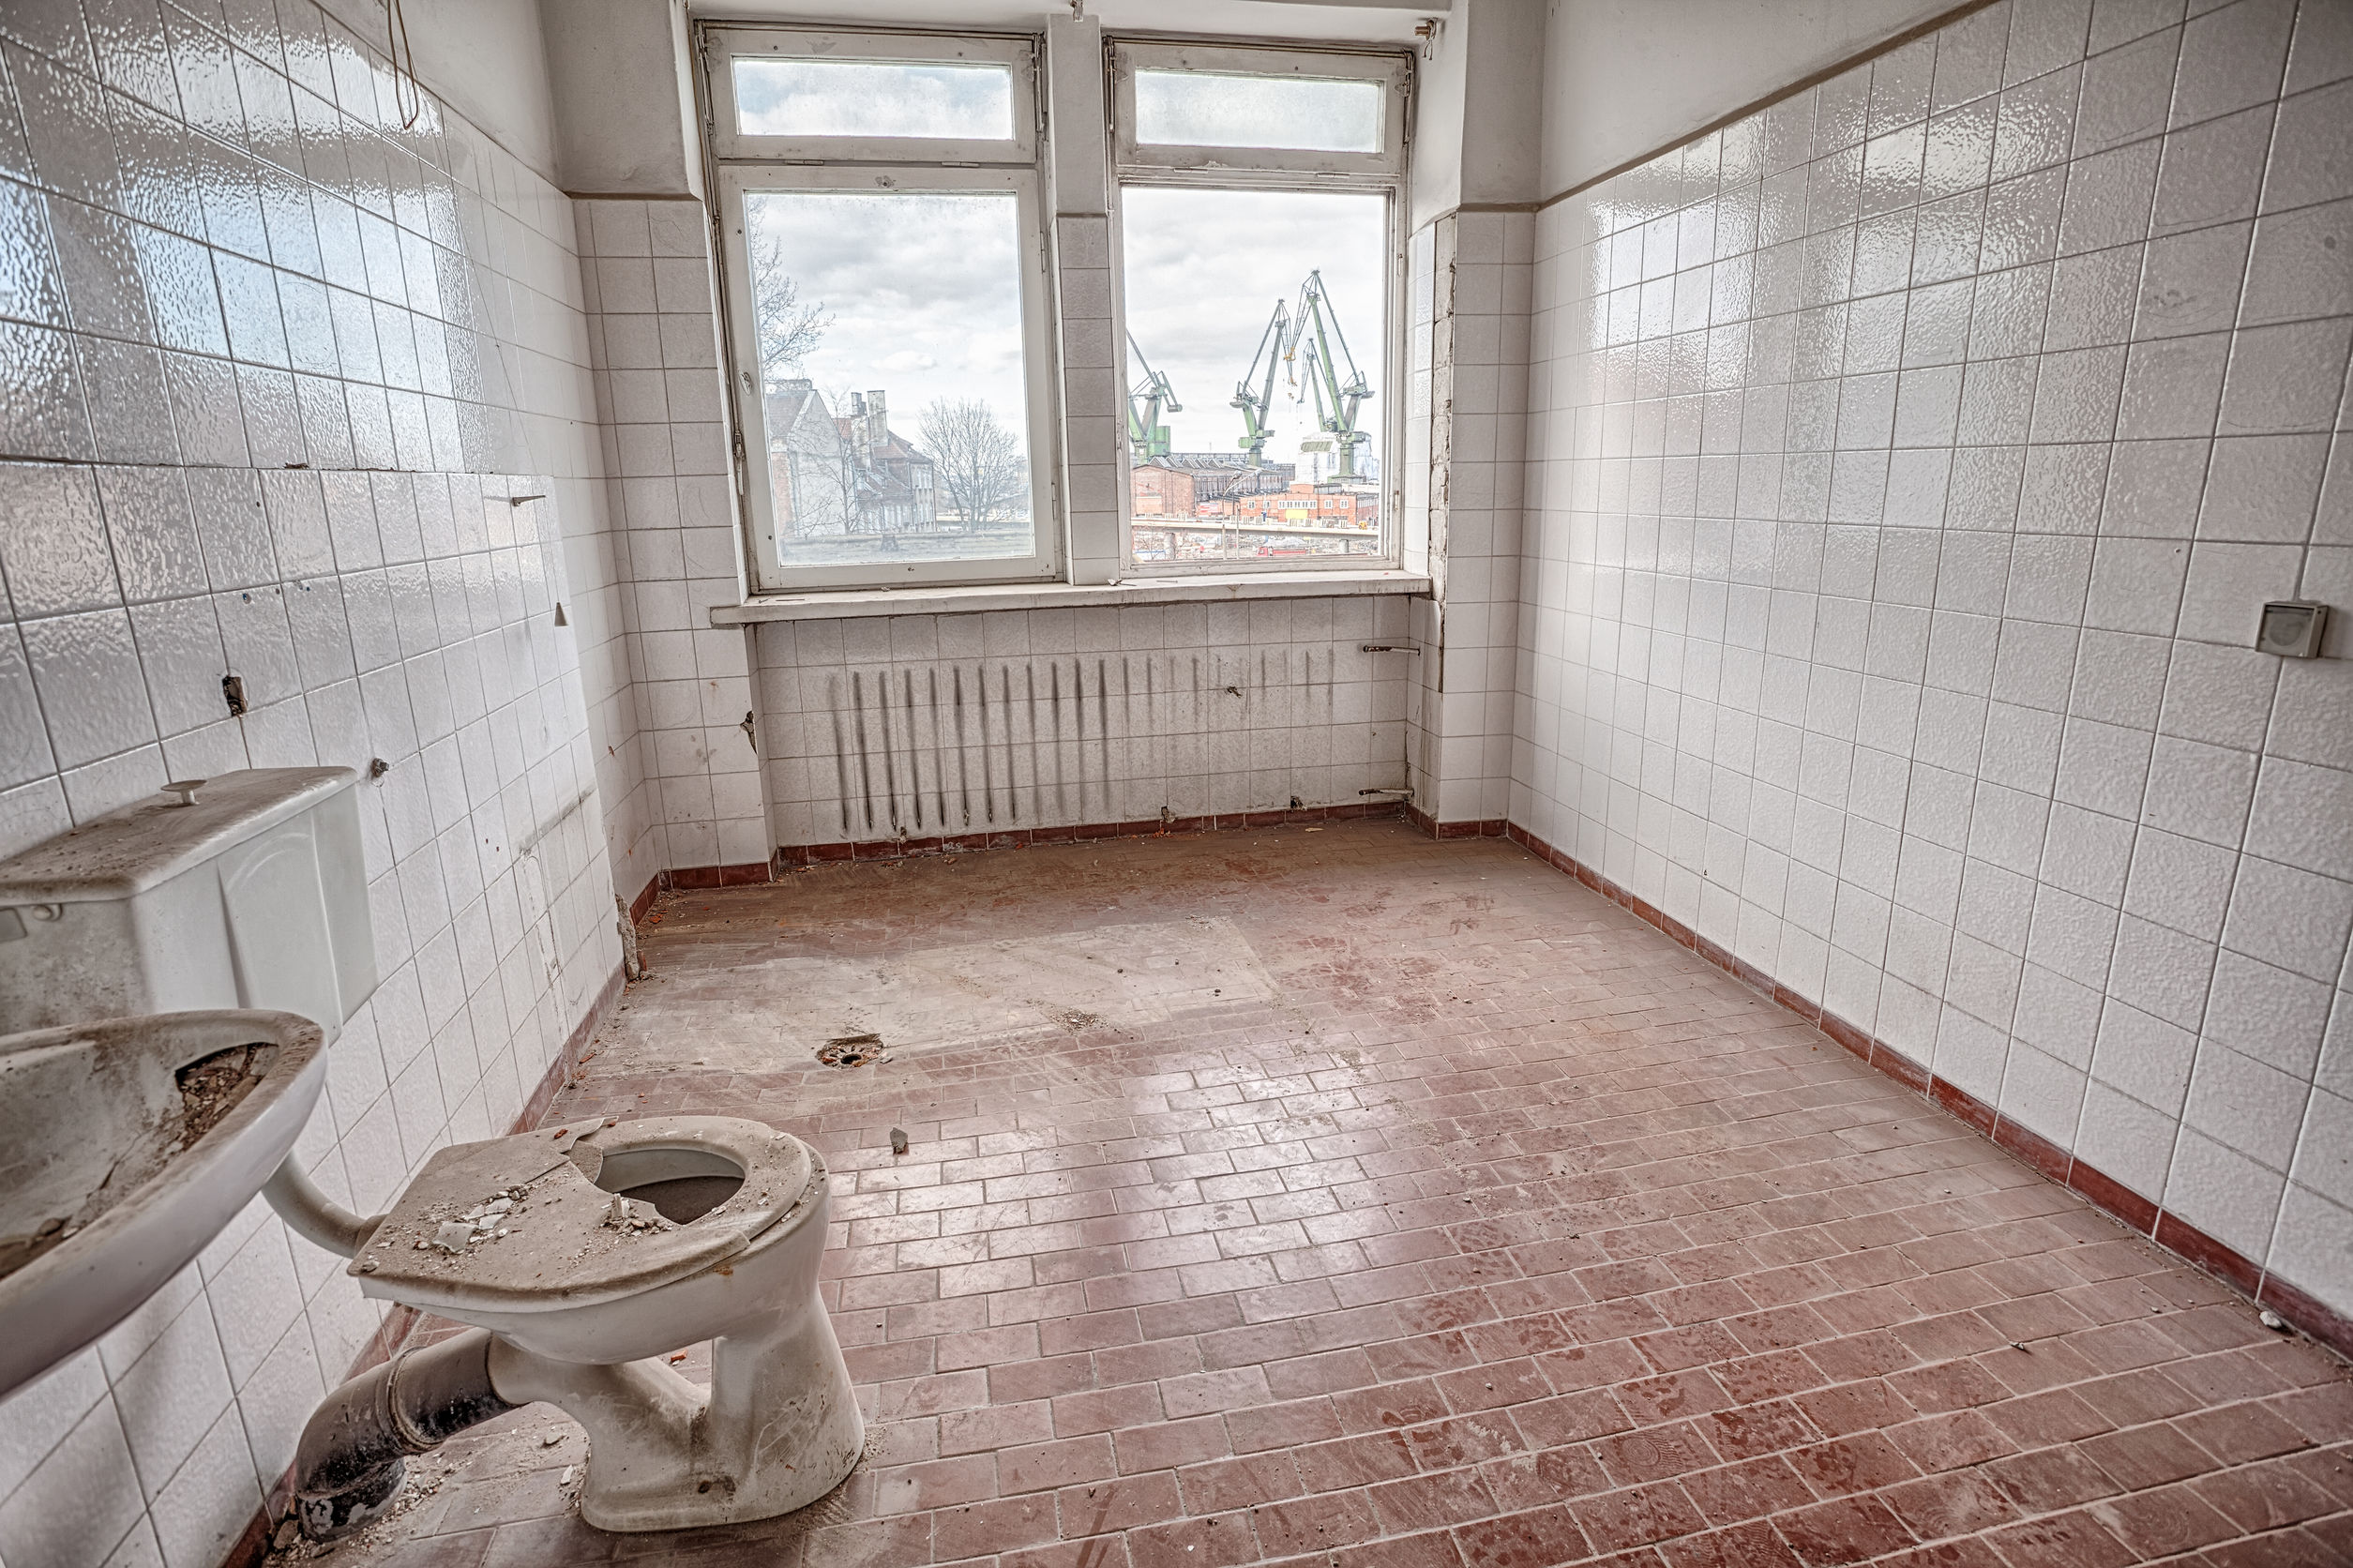 Ugly old bathroom